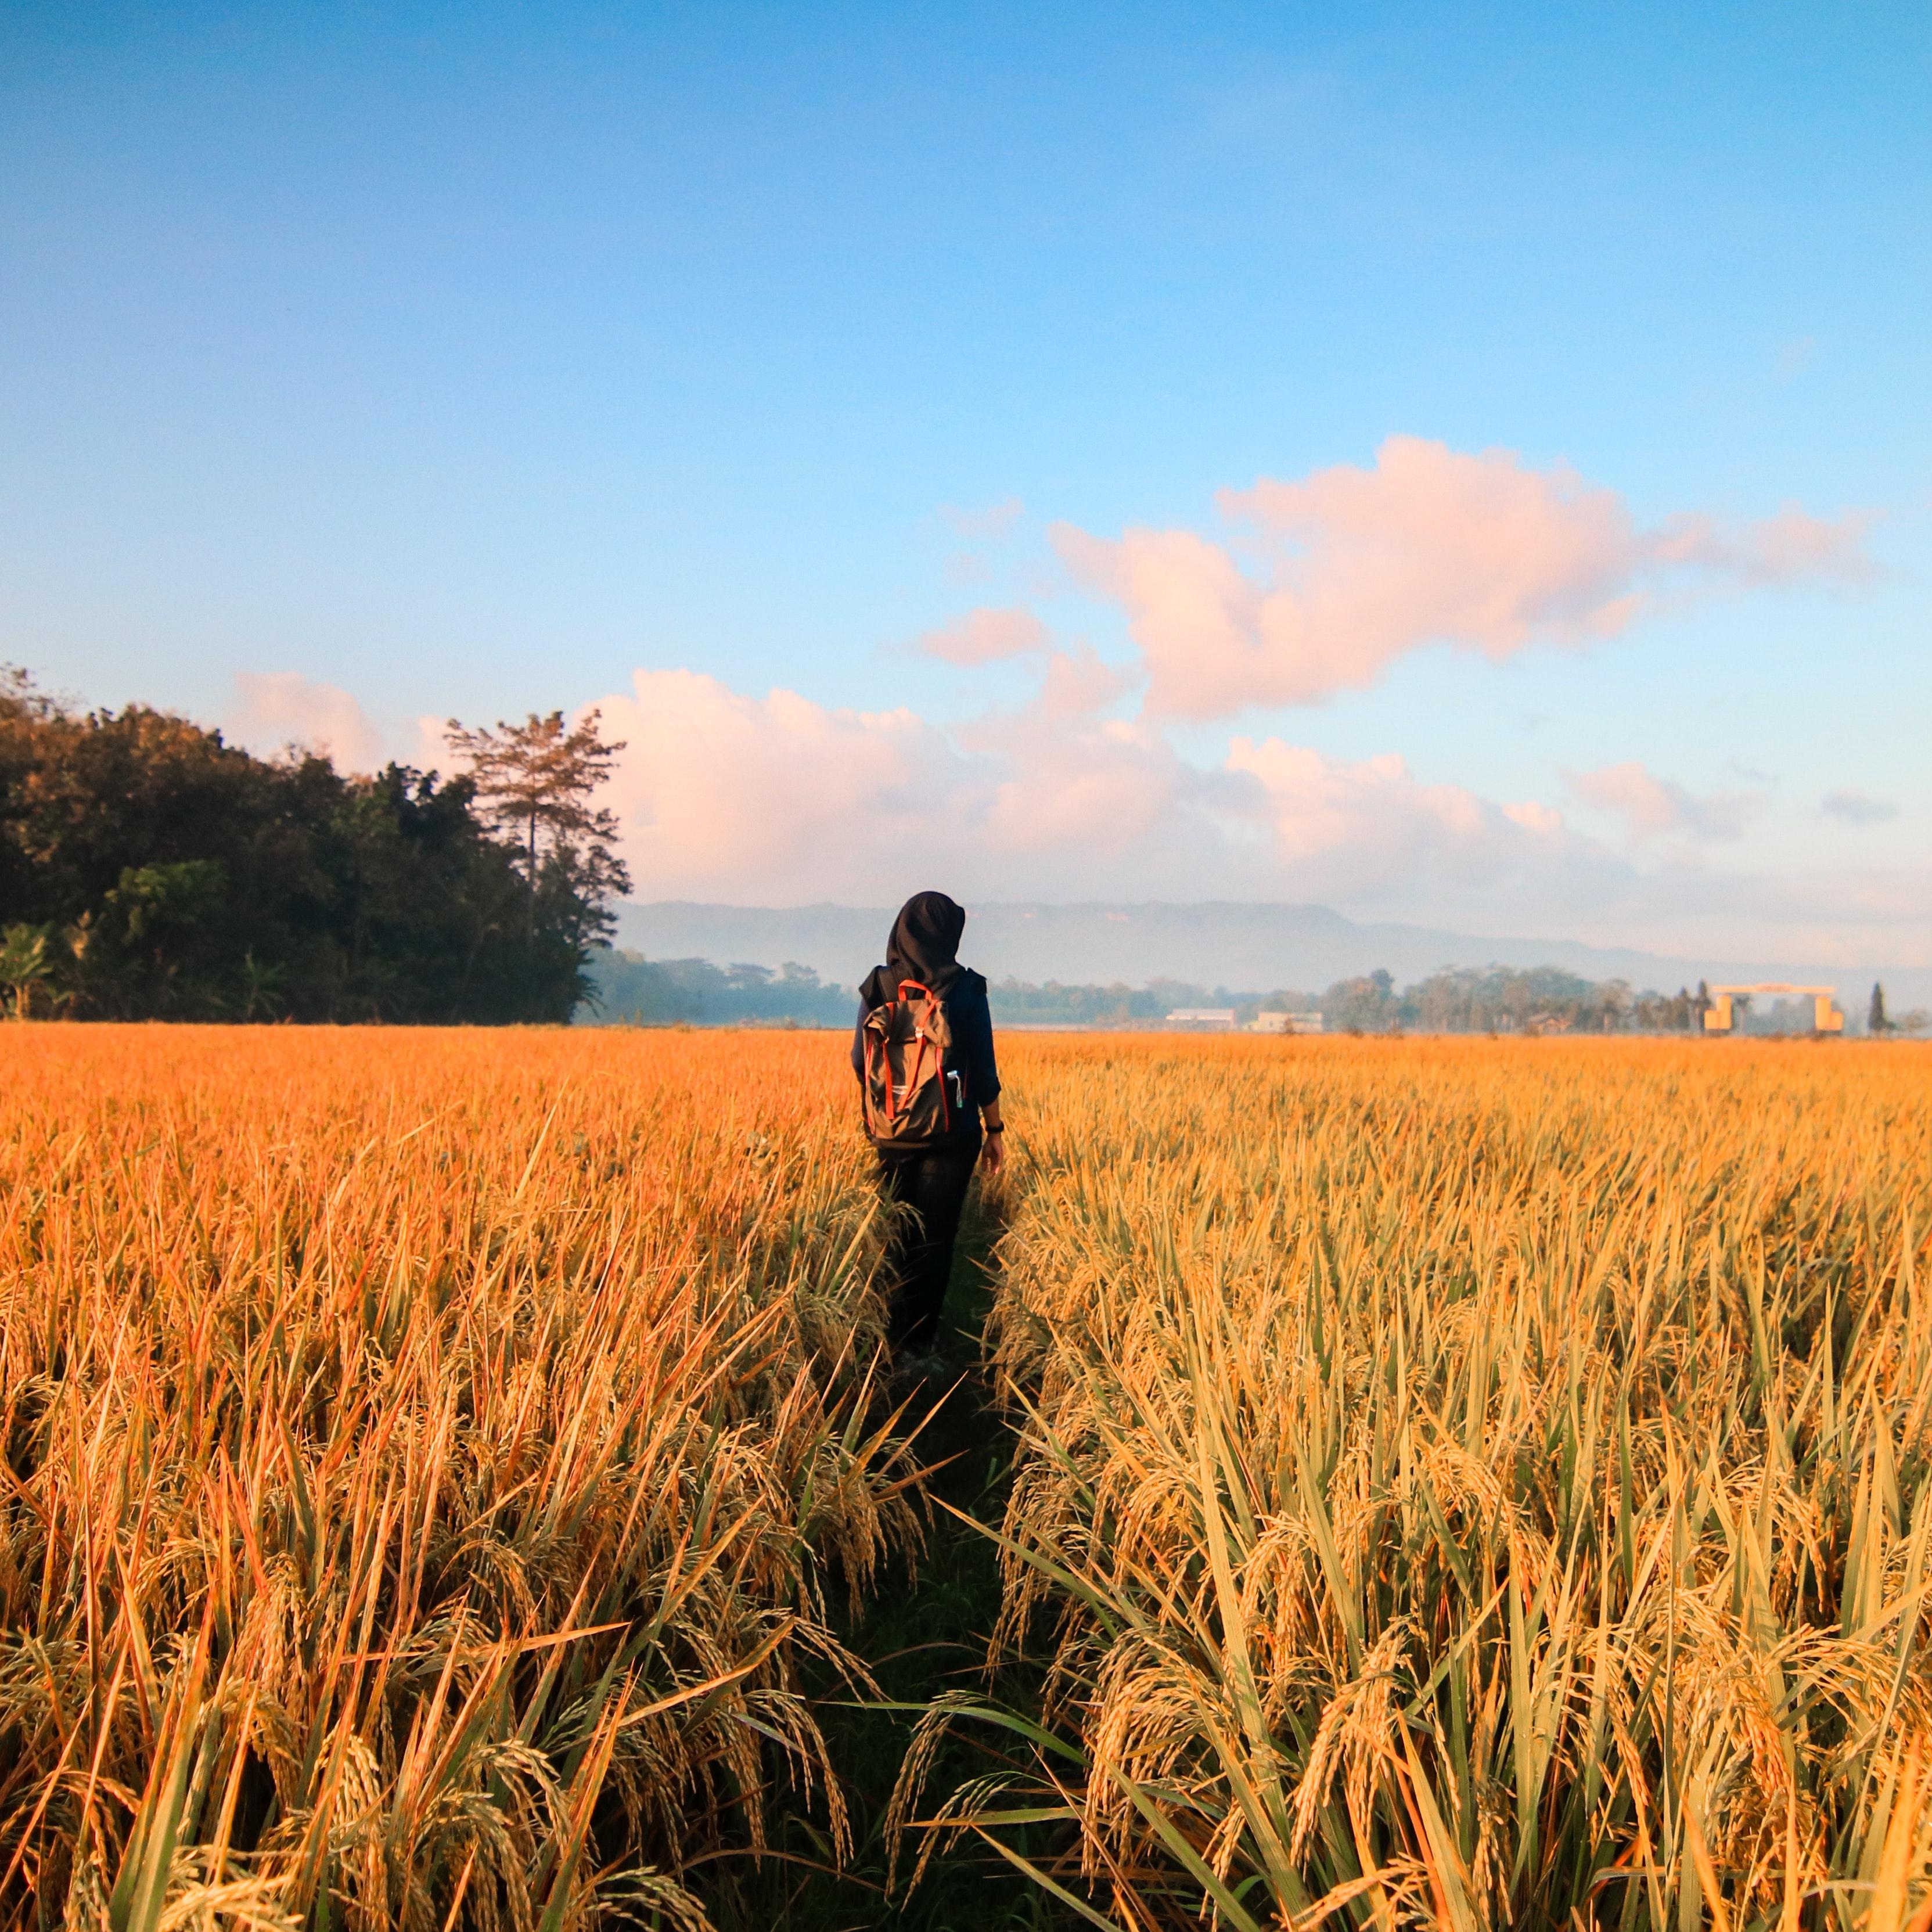 Woman in black hijab headscarf walking on field photo